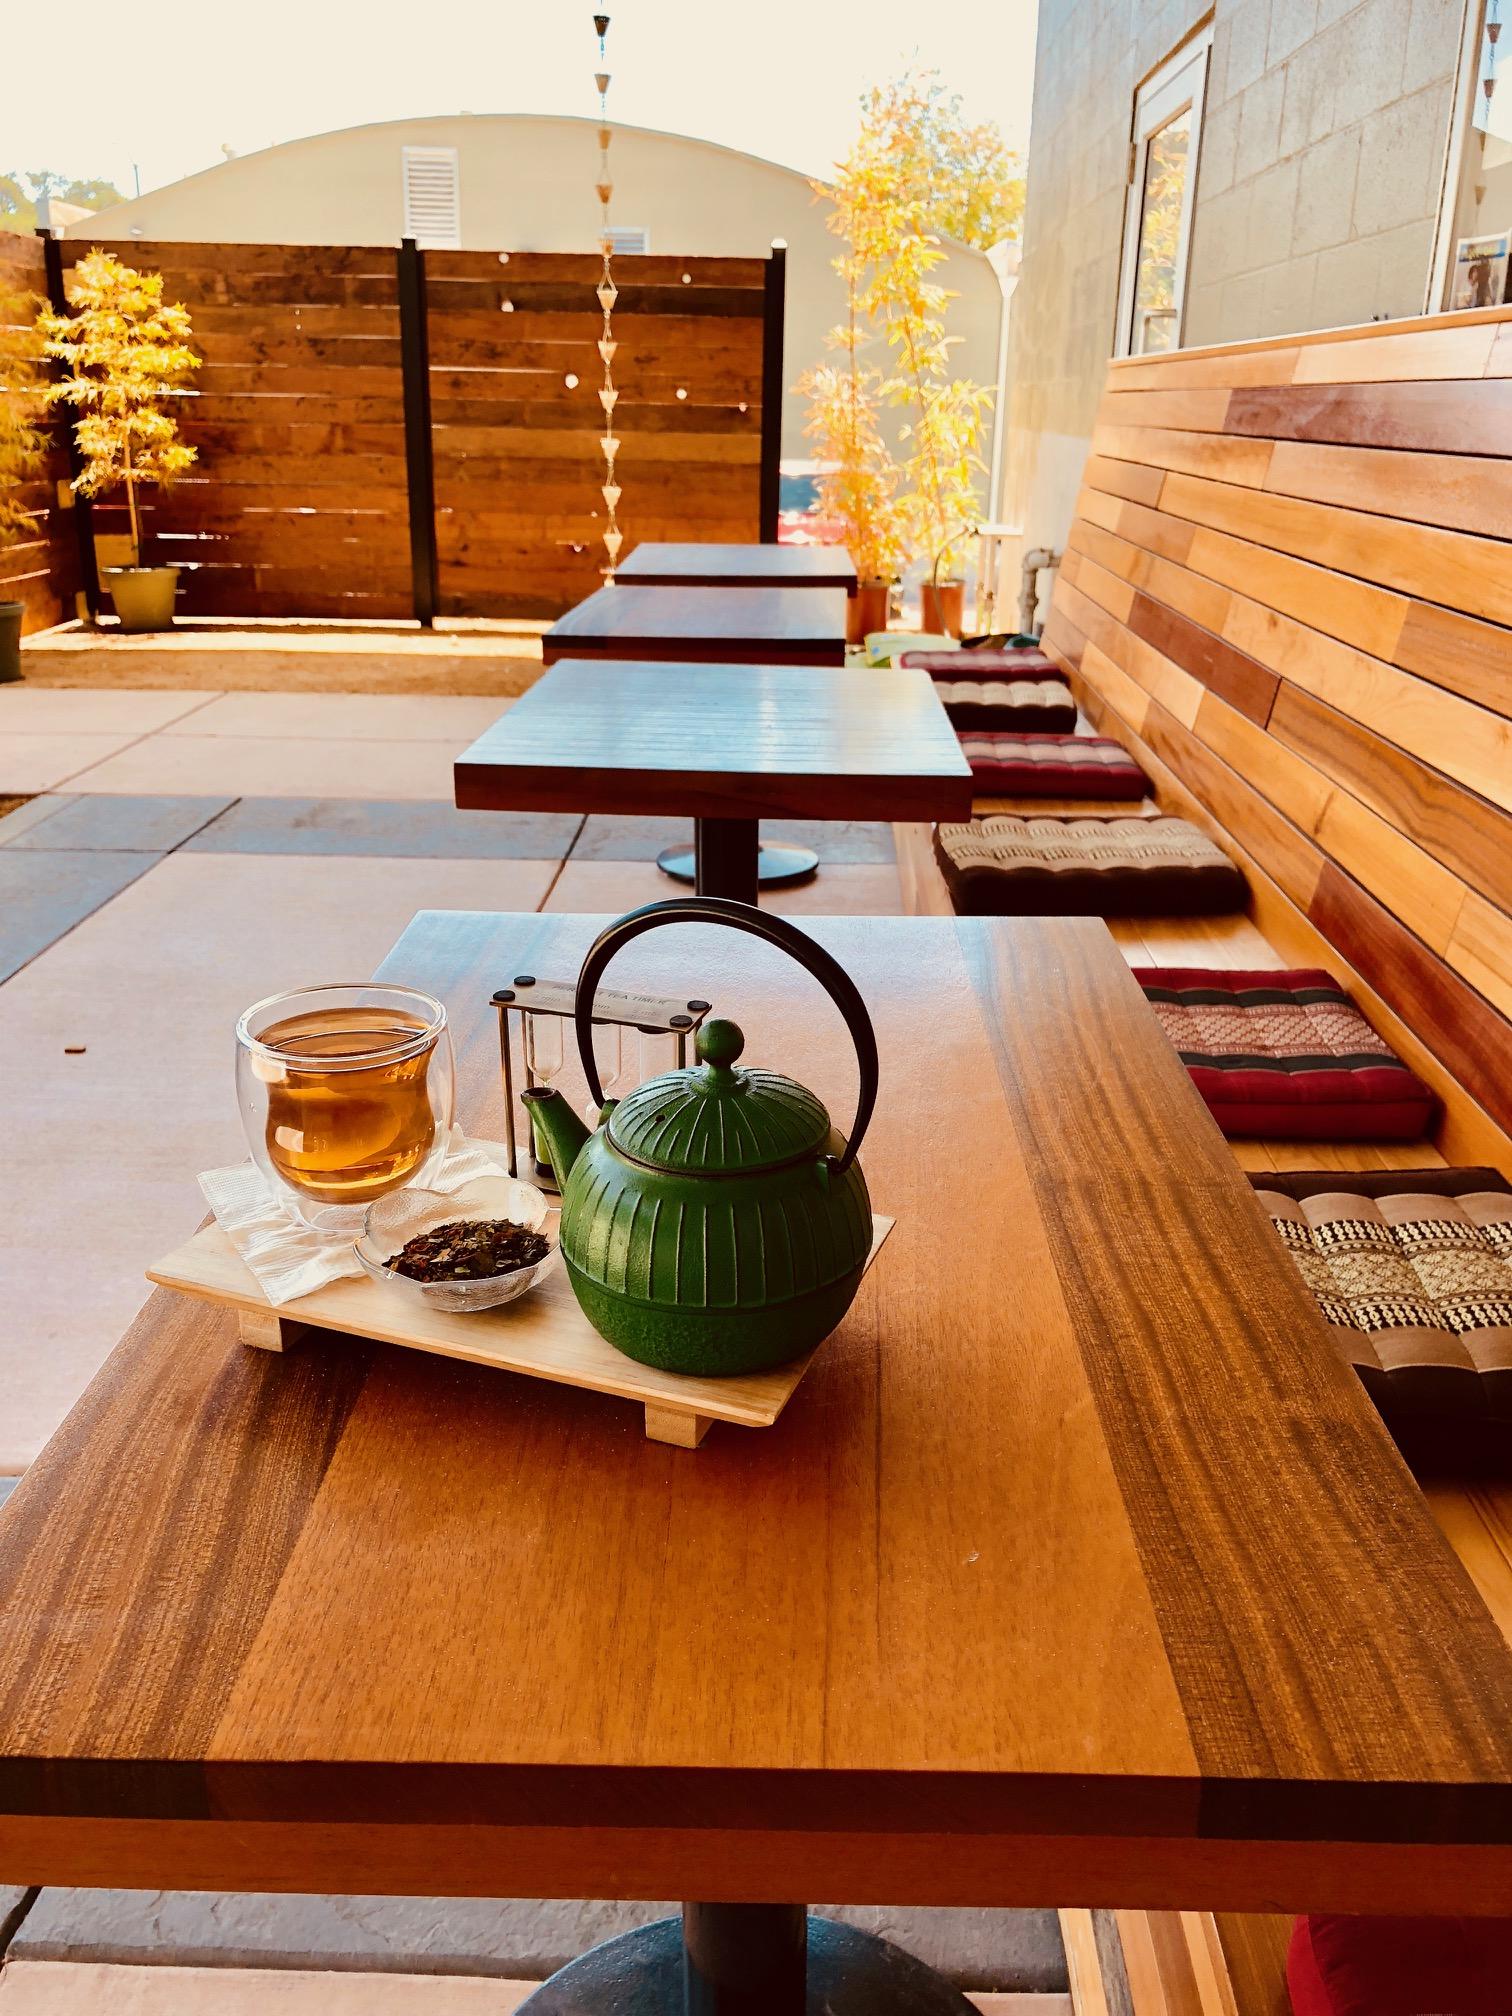 Tea on the patio